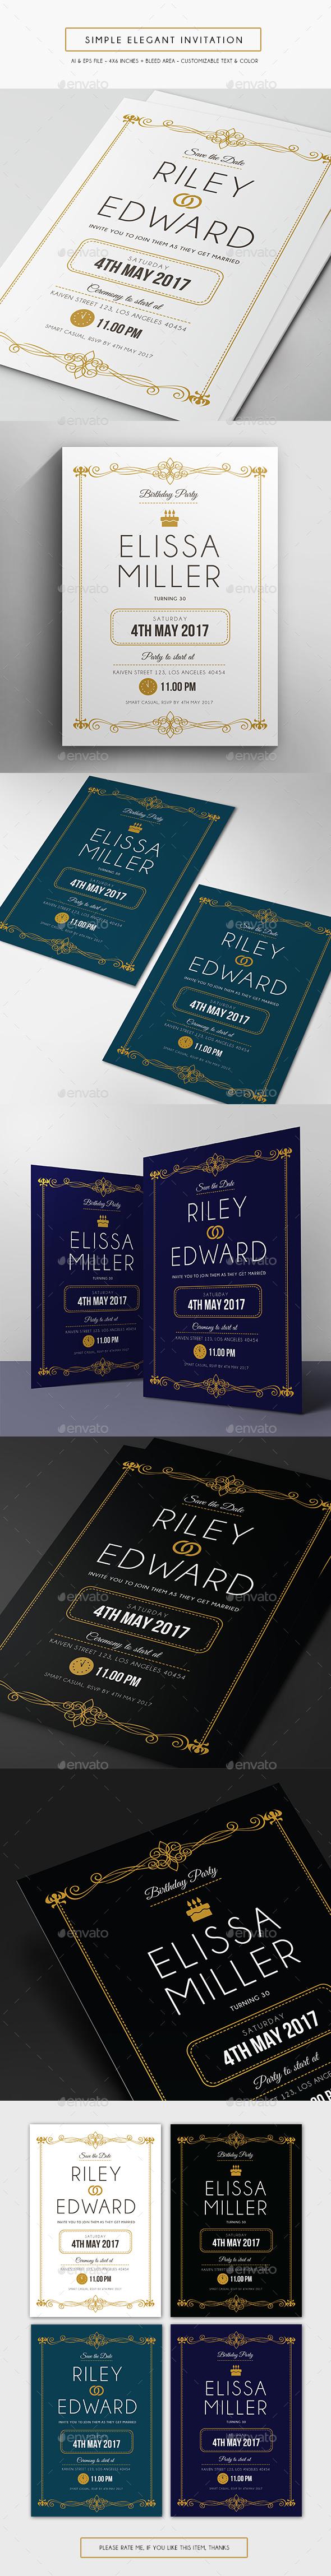 Simple Elegant Invitation - Invitations Cards & Invites